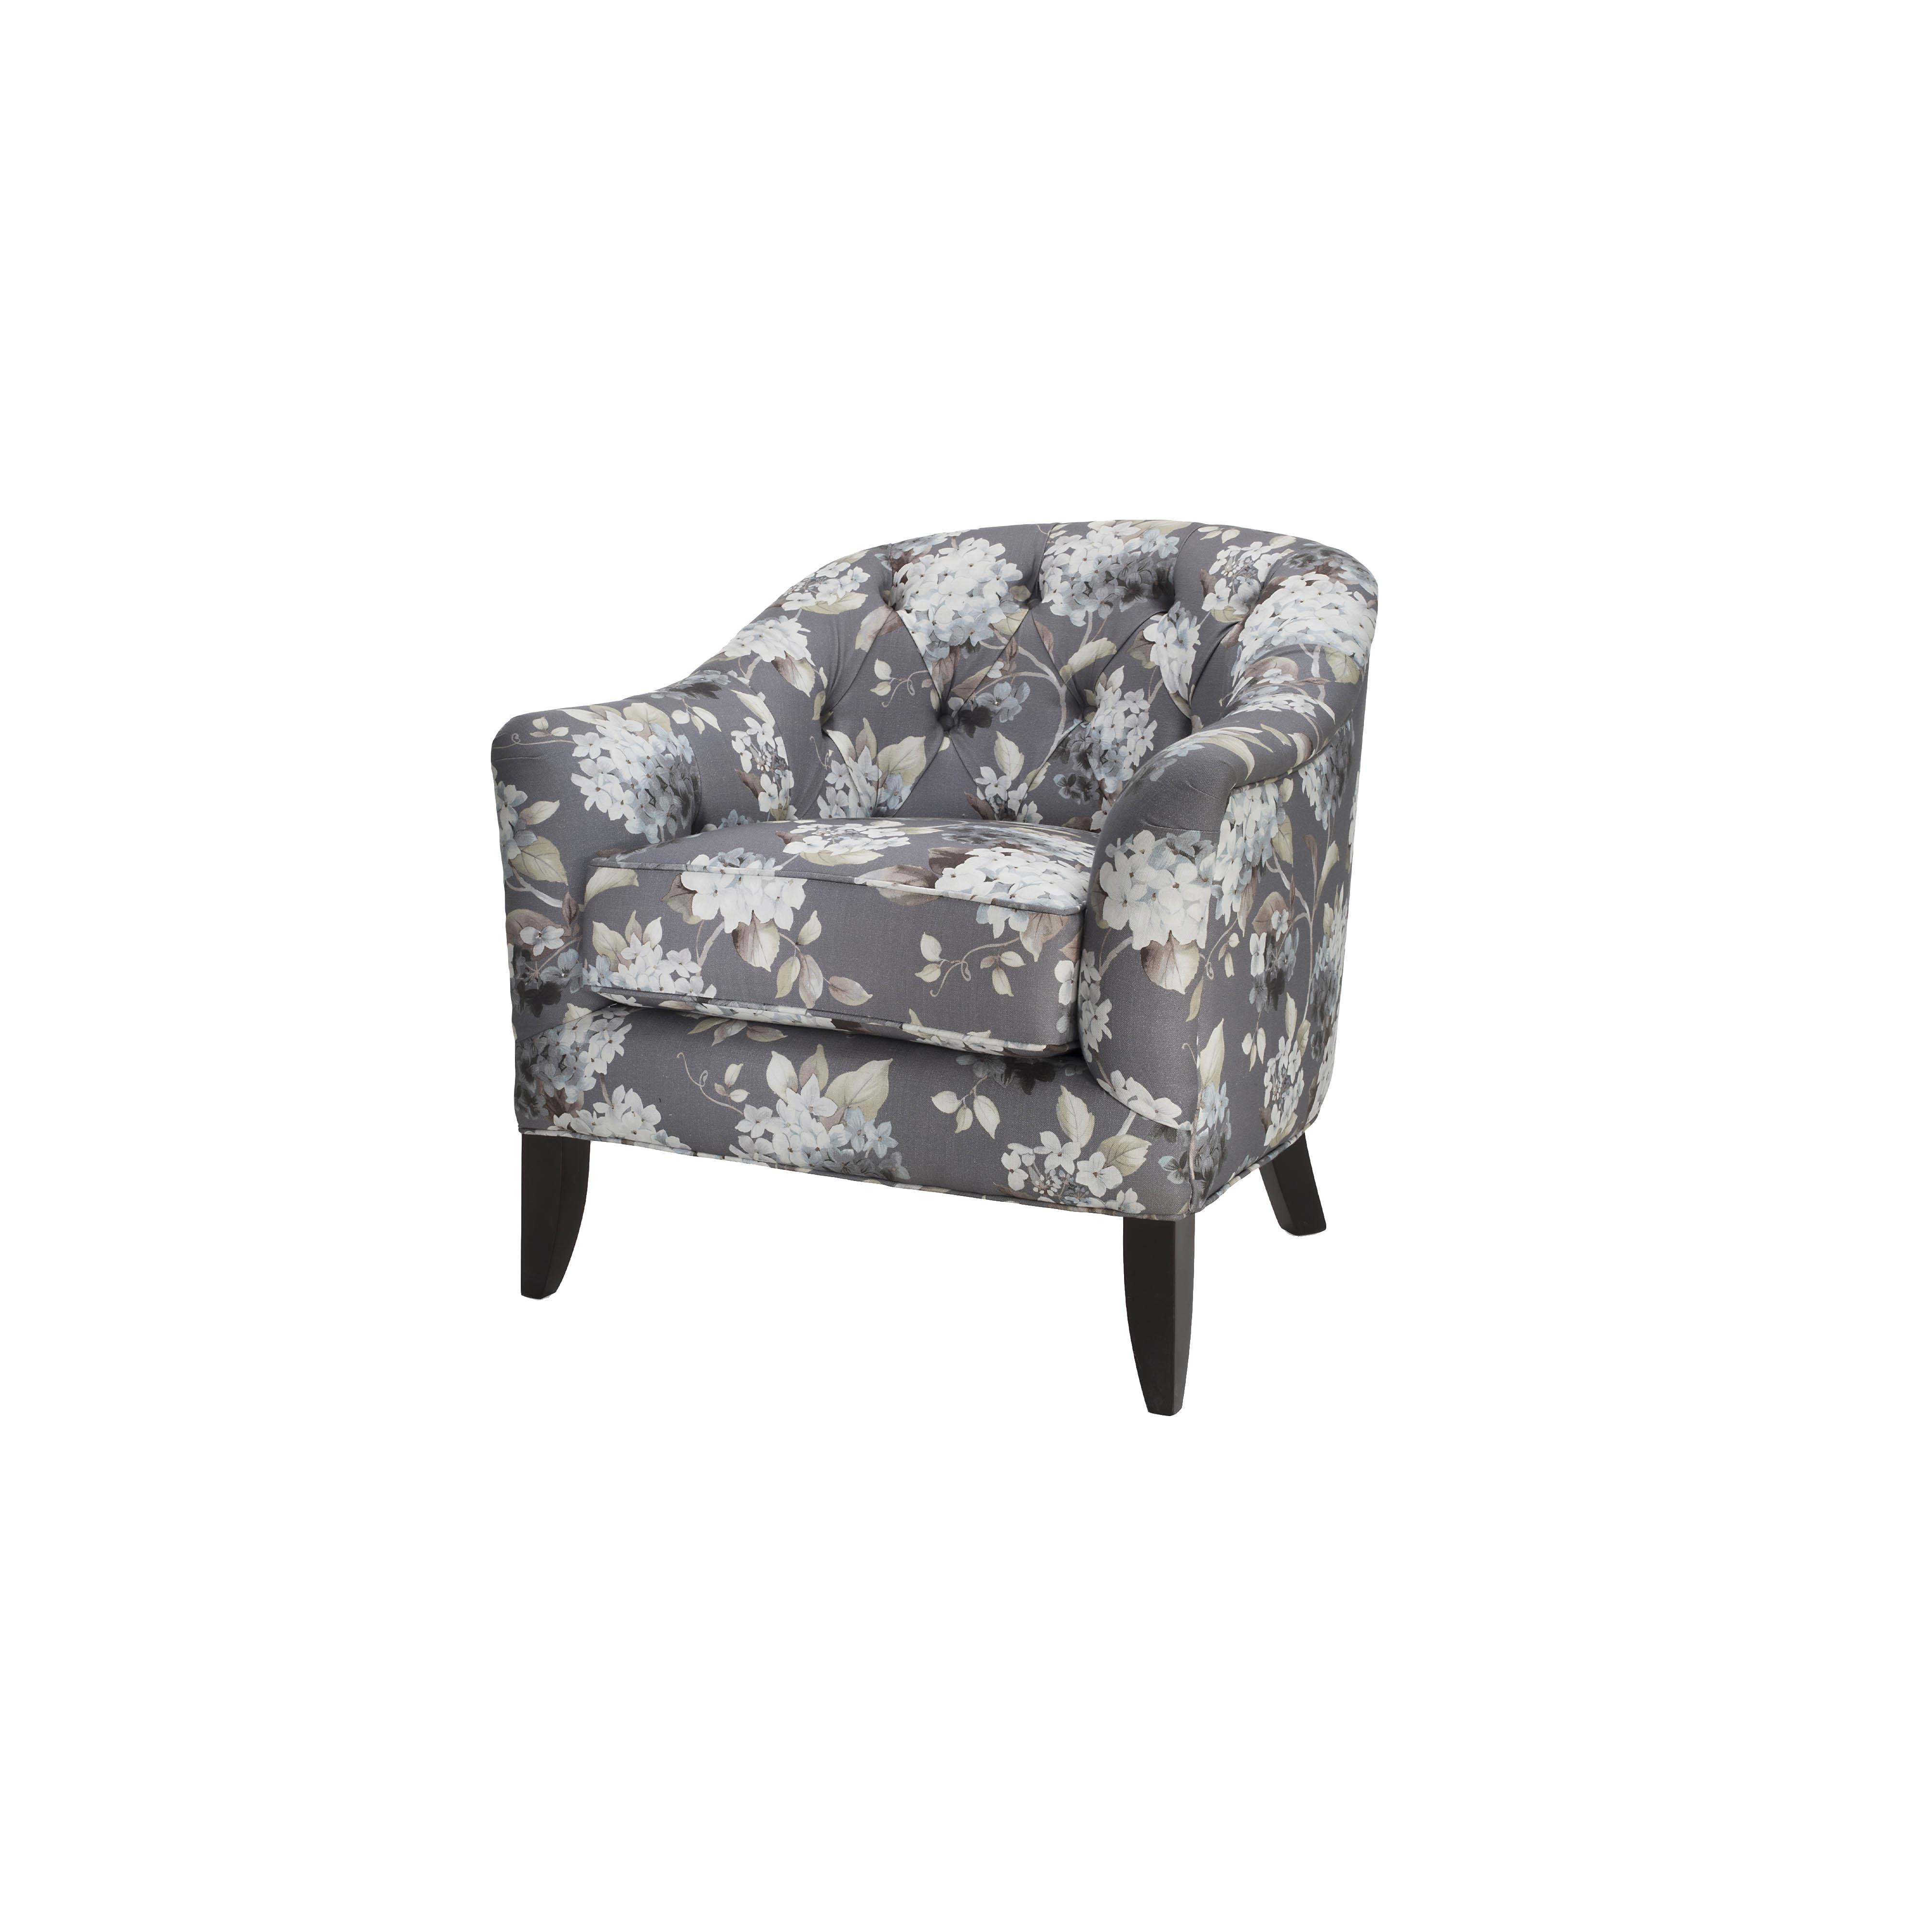 Azalea armchair